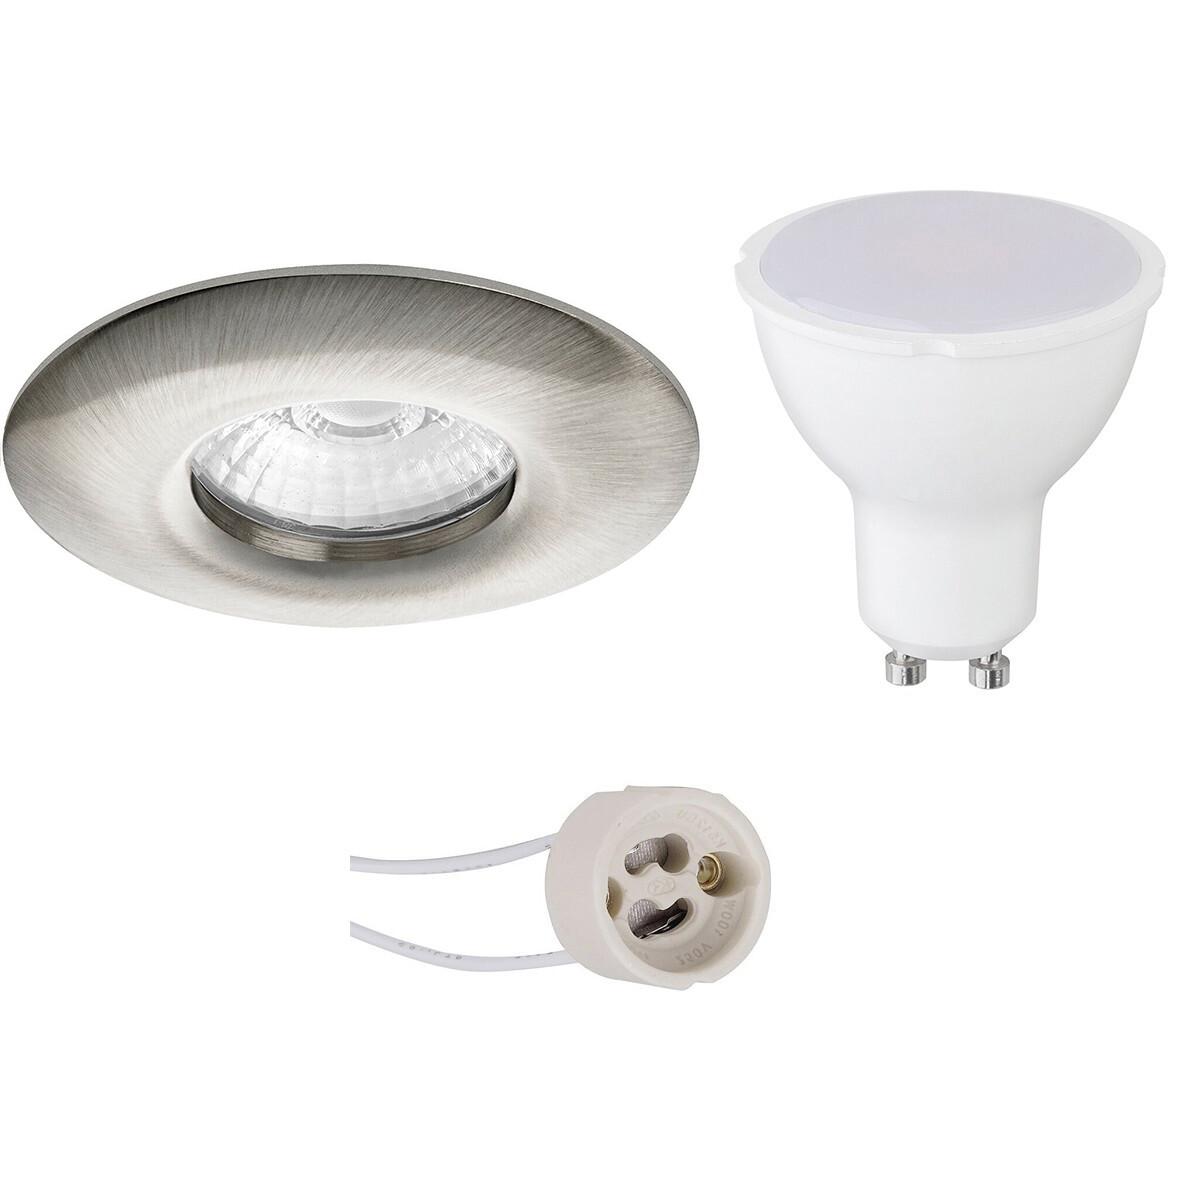 LED Spot Set - Pragmi Luno Pro - Waterdicht IP65 - GU10 Fitting - Inbouw Rond - Mat Nikkel - 8W - Na